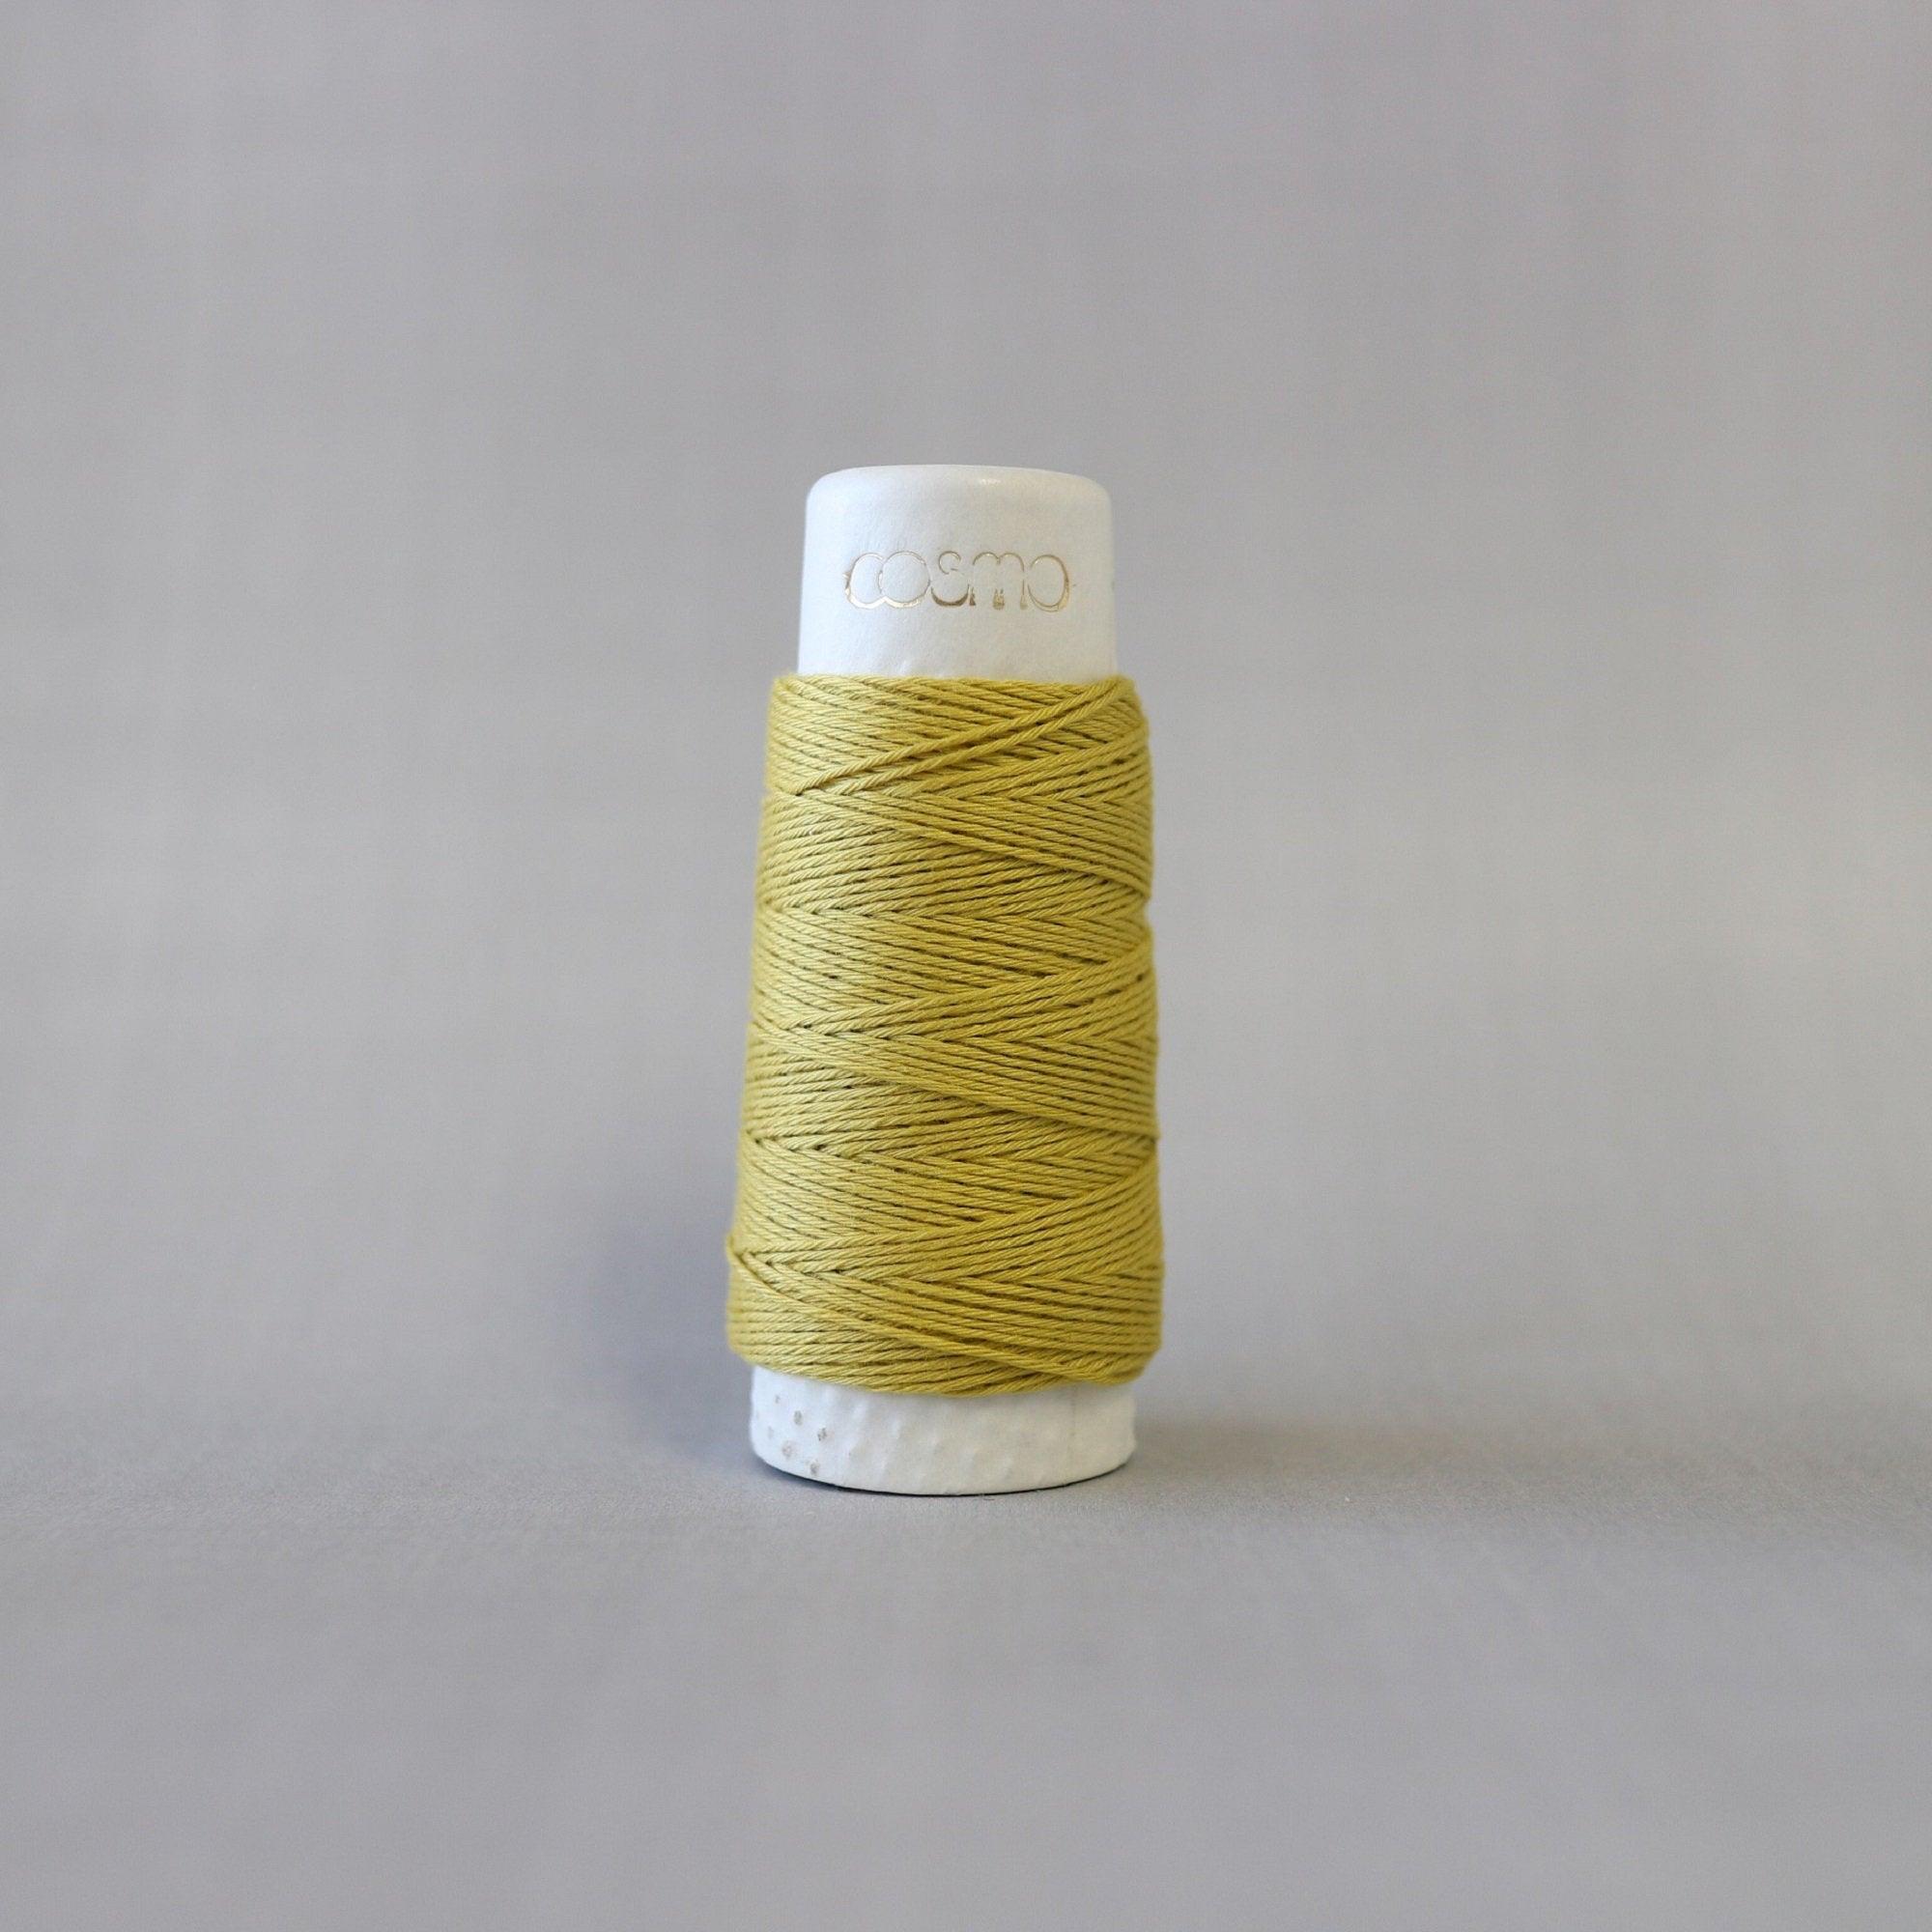 Lecien COSMO hidamari & Sashiko Cotton Thread - 30m - No. 88-14 Olive